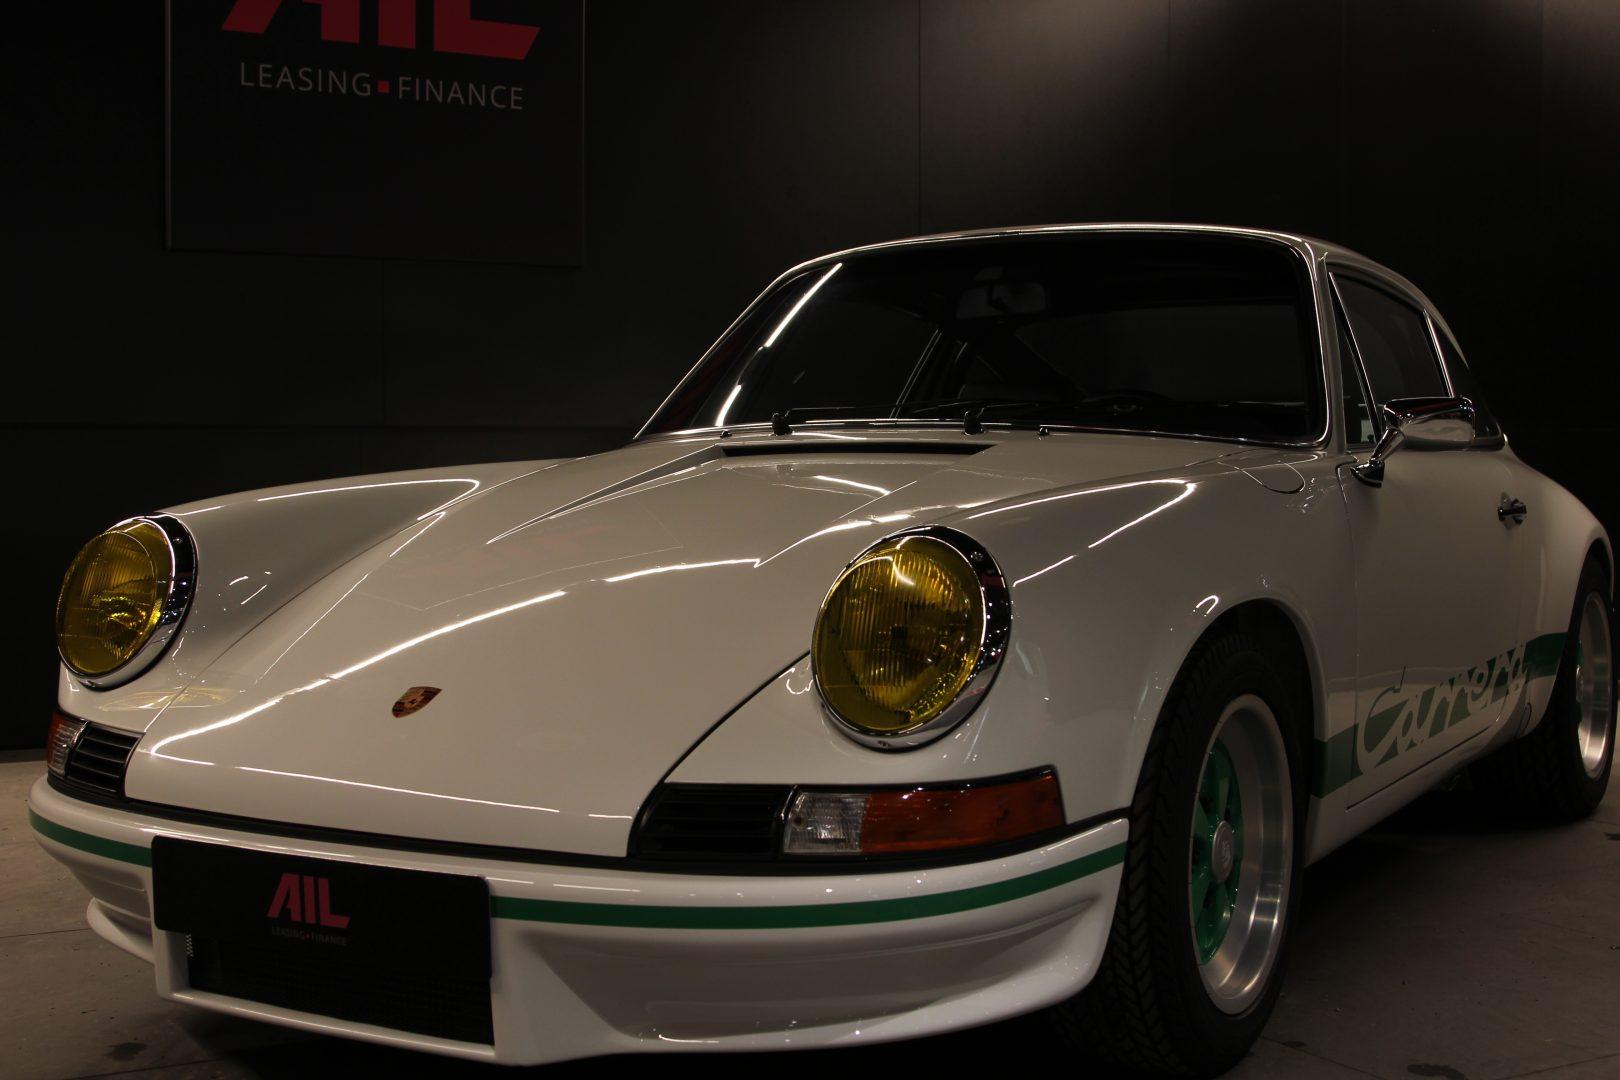 AIL Porsche 911 T 2.7 RS Recreation   2